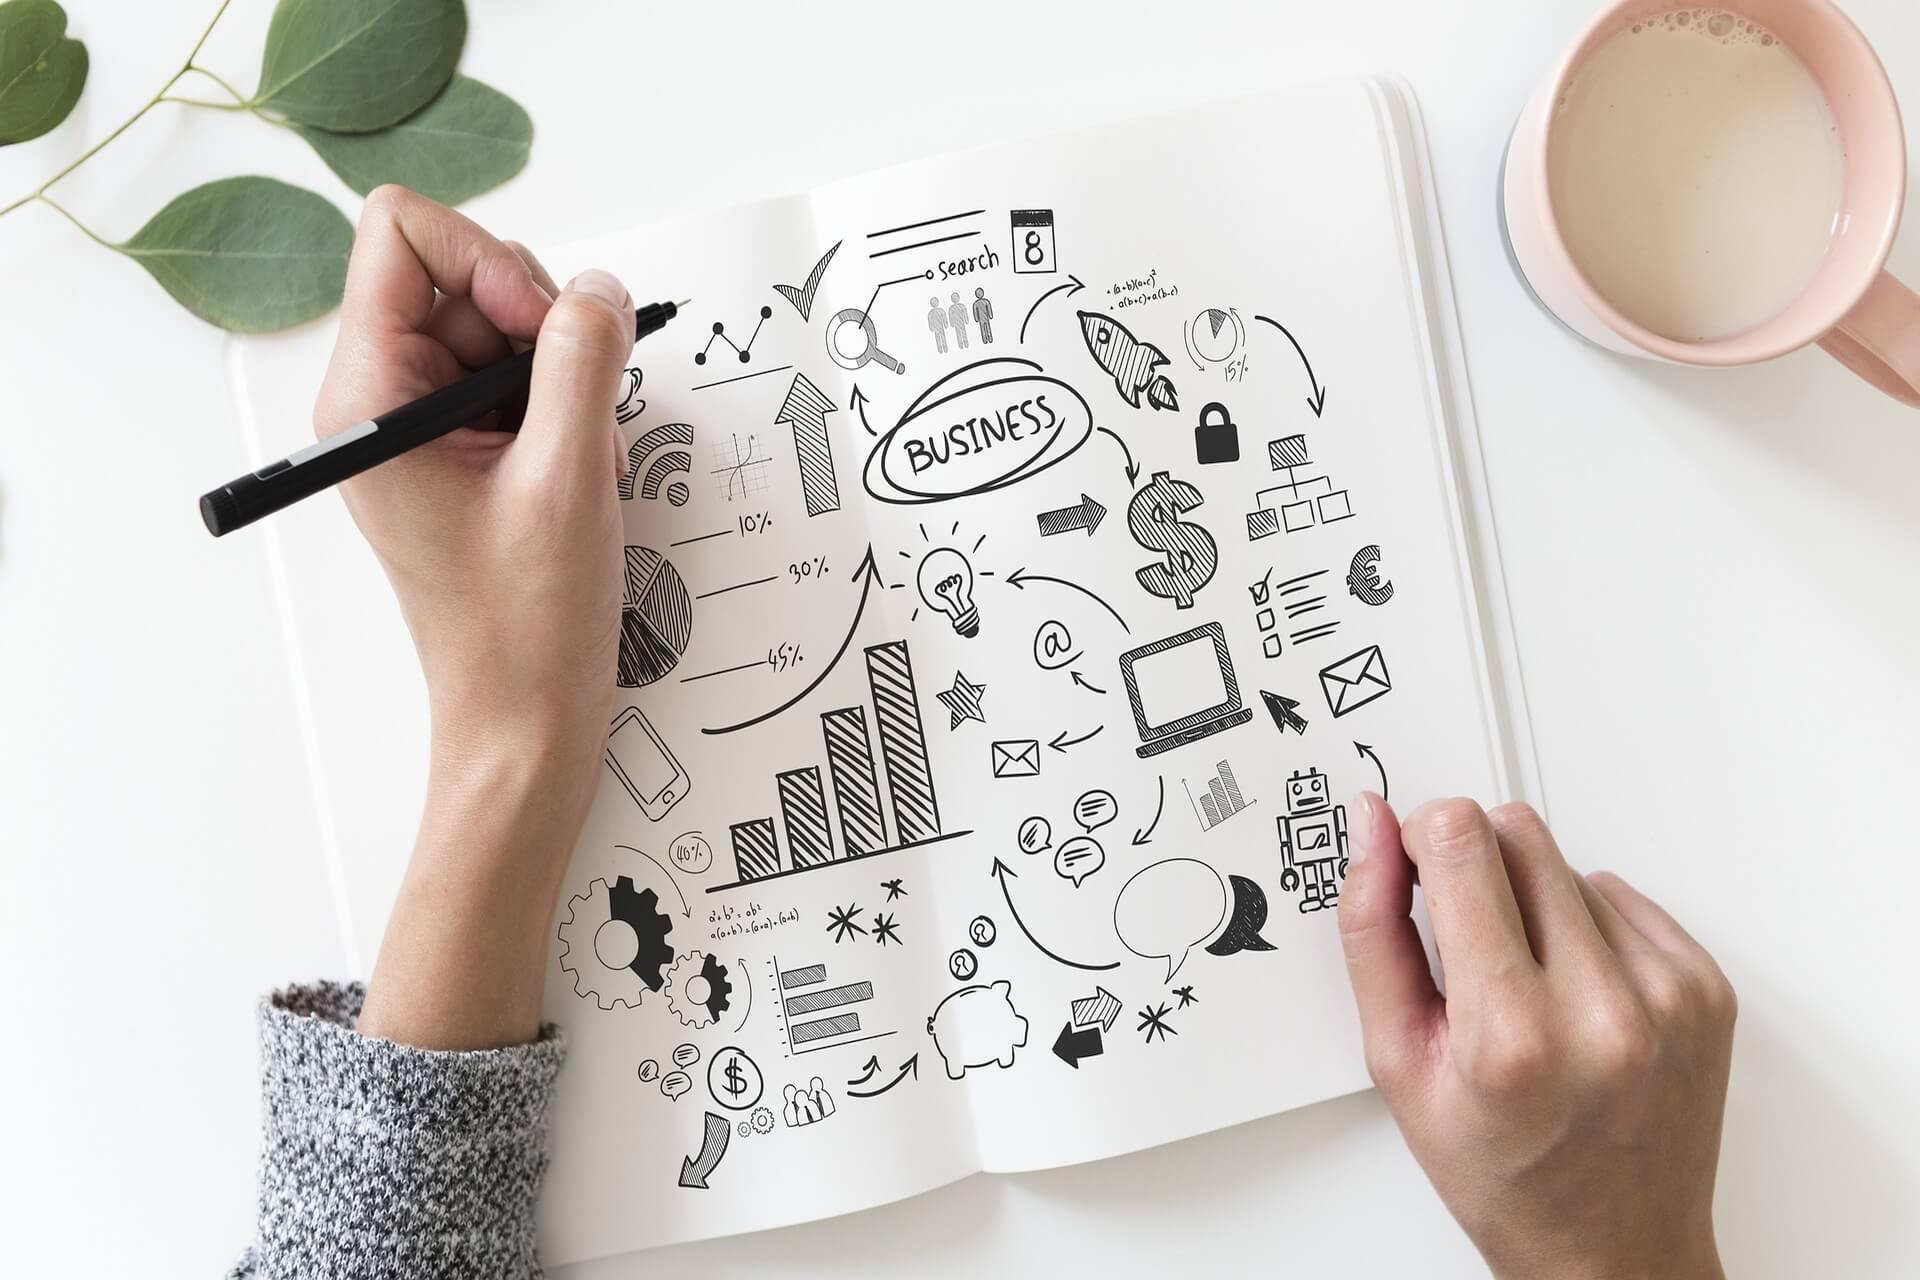 Business Plan Writing Technique-Business Plan Consultant-BrainHive-2